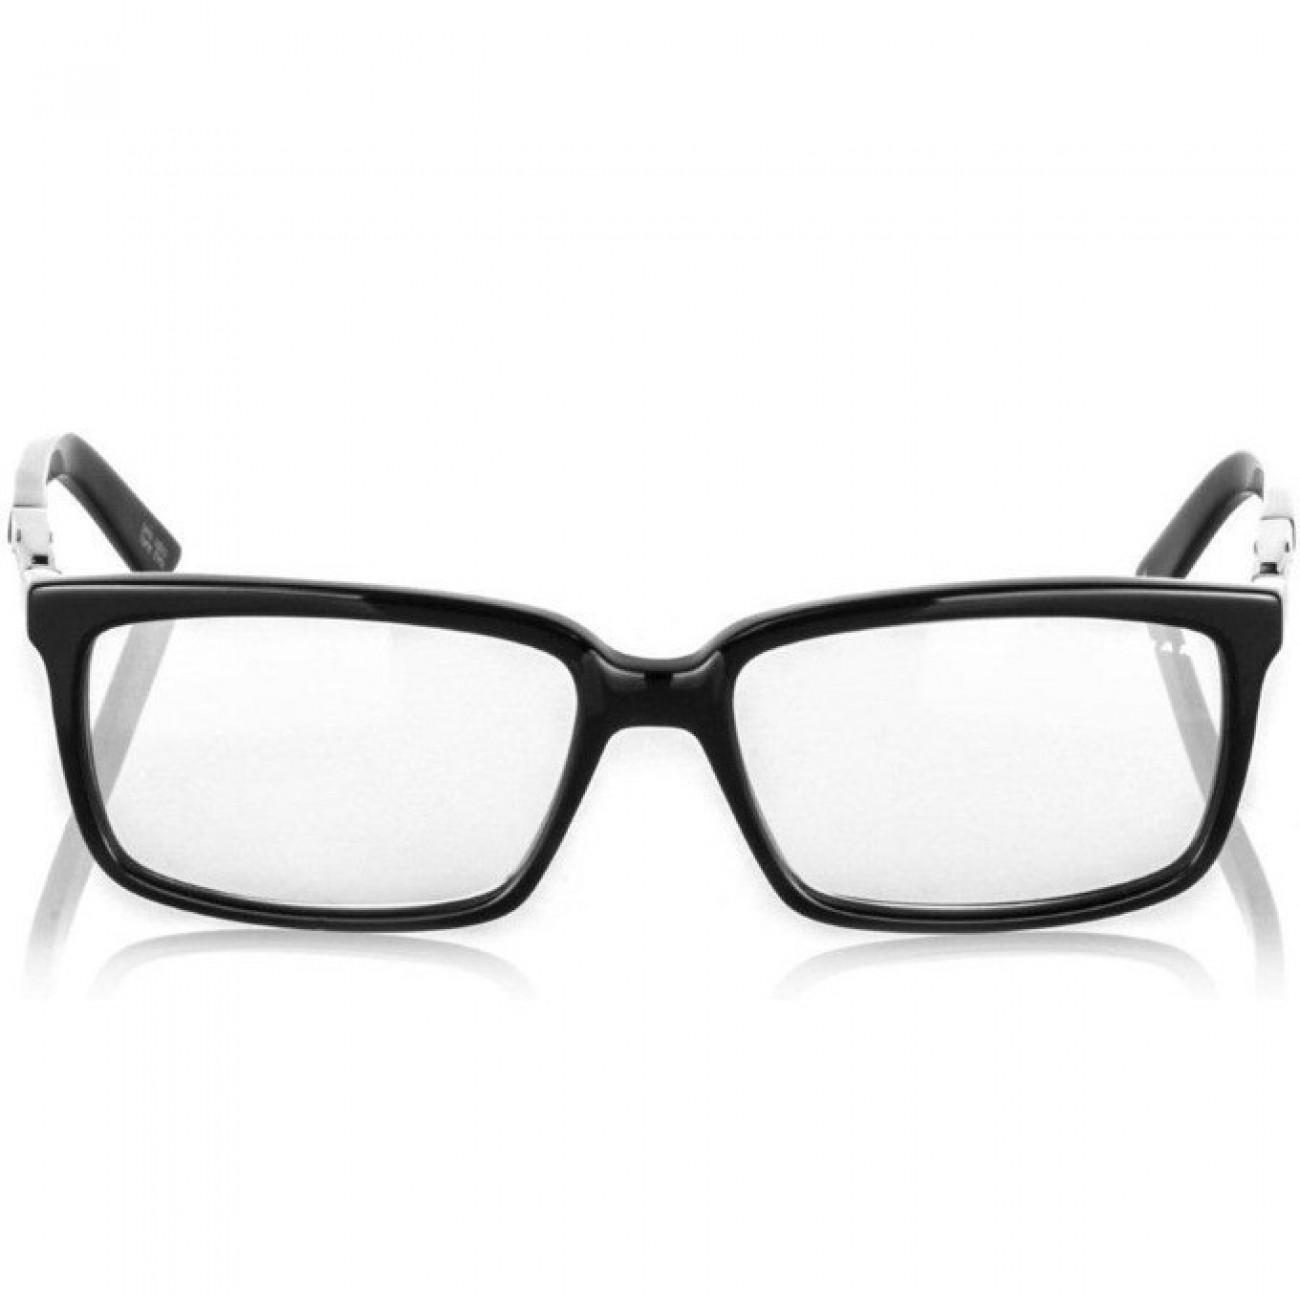 Oчила Gunnar Haus Onyx, Crystalline, гейминг, черни в Гейминг аксесоари -  | Alleop